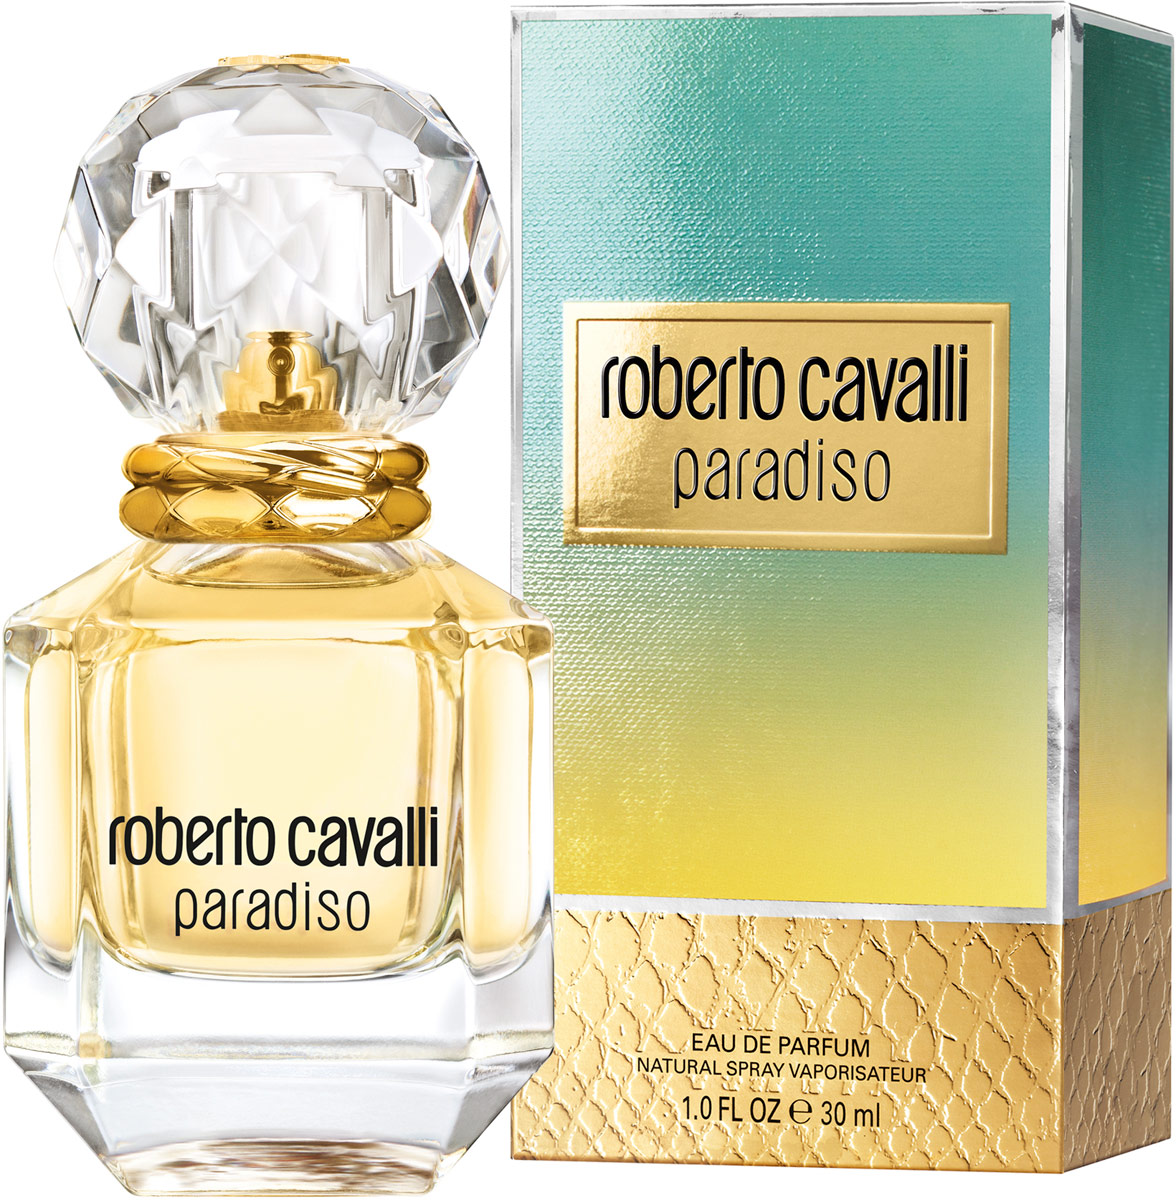 Roberto Cavalli Парфюмерная вода Paradiso, женская, 30 мл